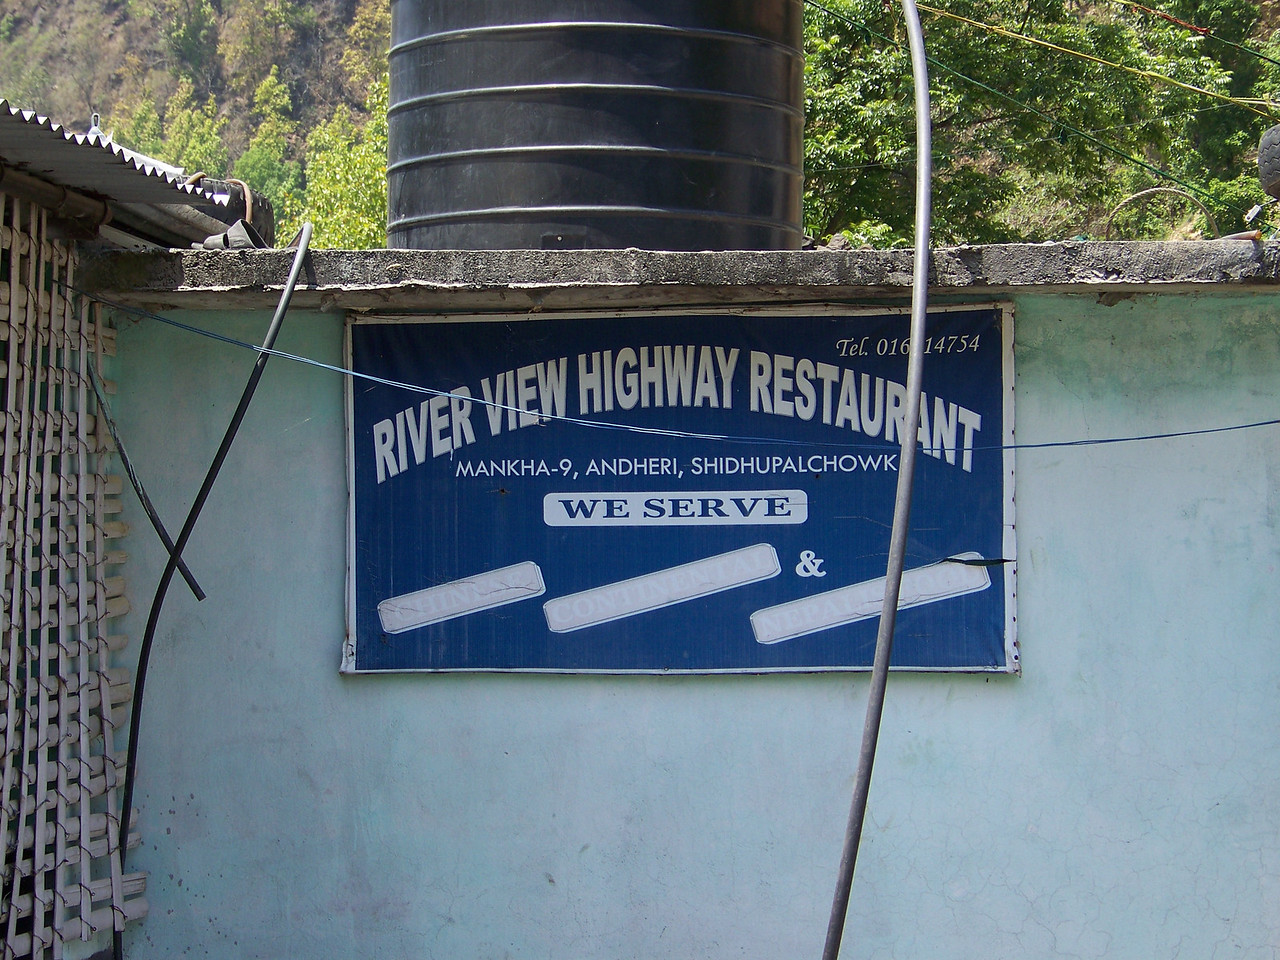 0661 - Sign for the River View Restaurant overlooking the Bhote Koshi River - Andheri Shidhupalchowk Nepal.JPG